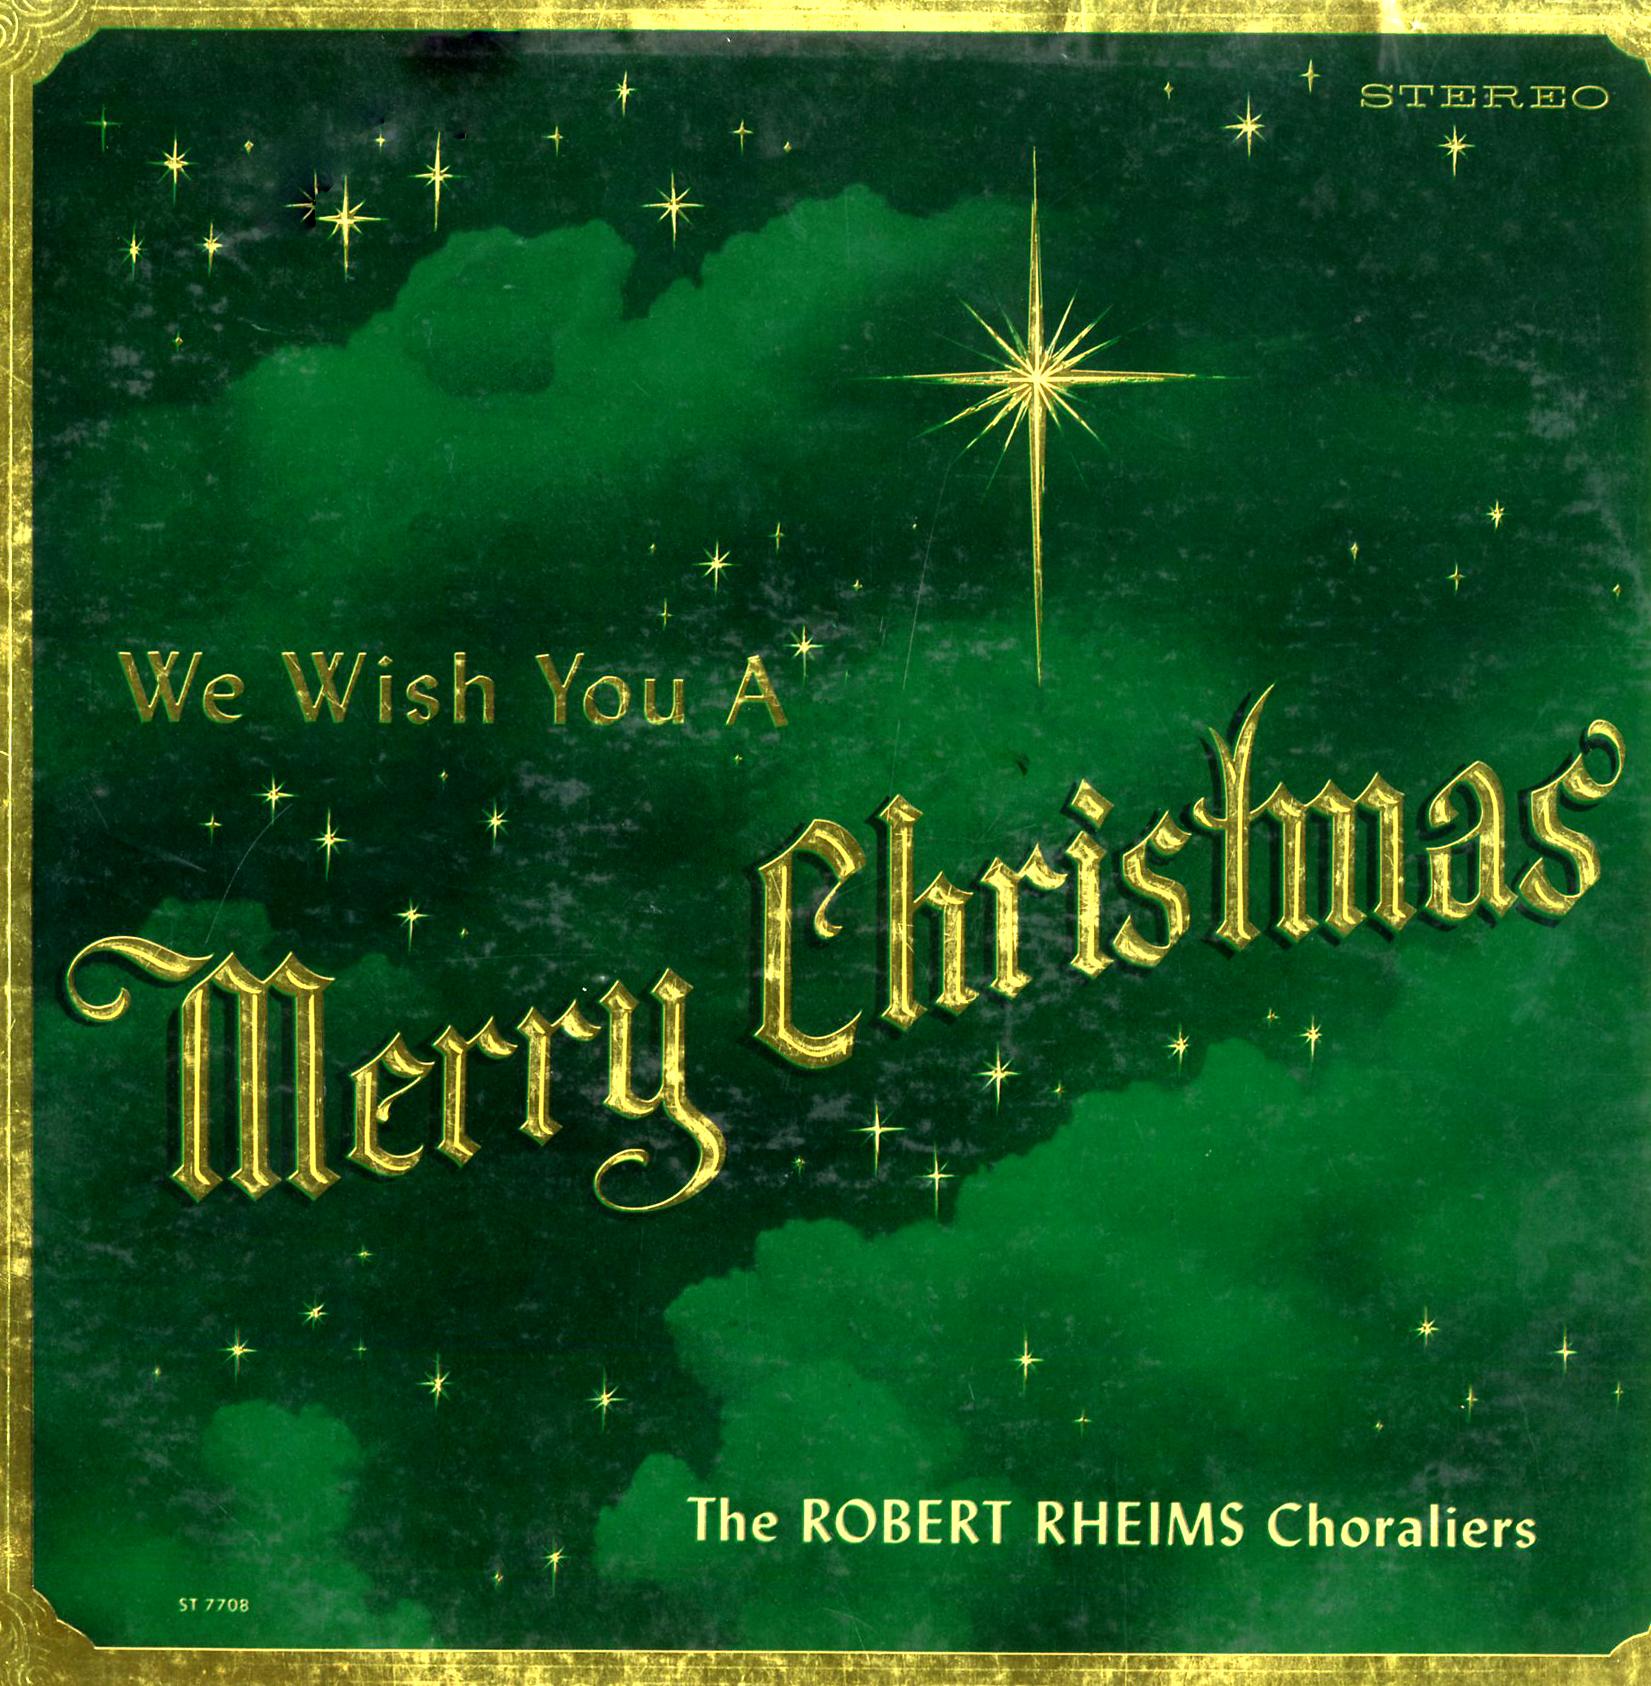 MP3 Download 320mb. Rheims, Robert. We Wish You a Merry Christmas (ST7708) - Christmas LPs to CD ...